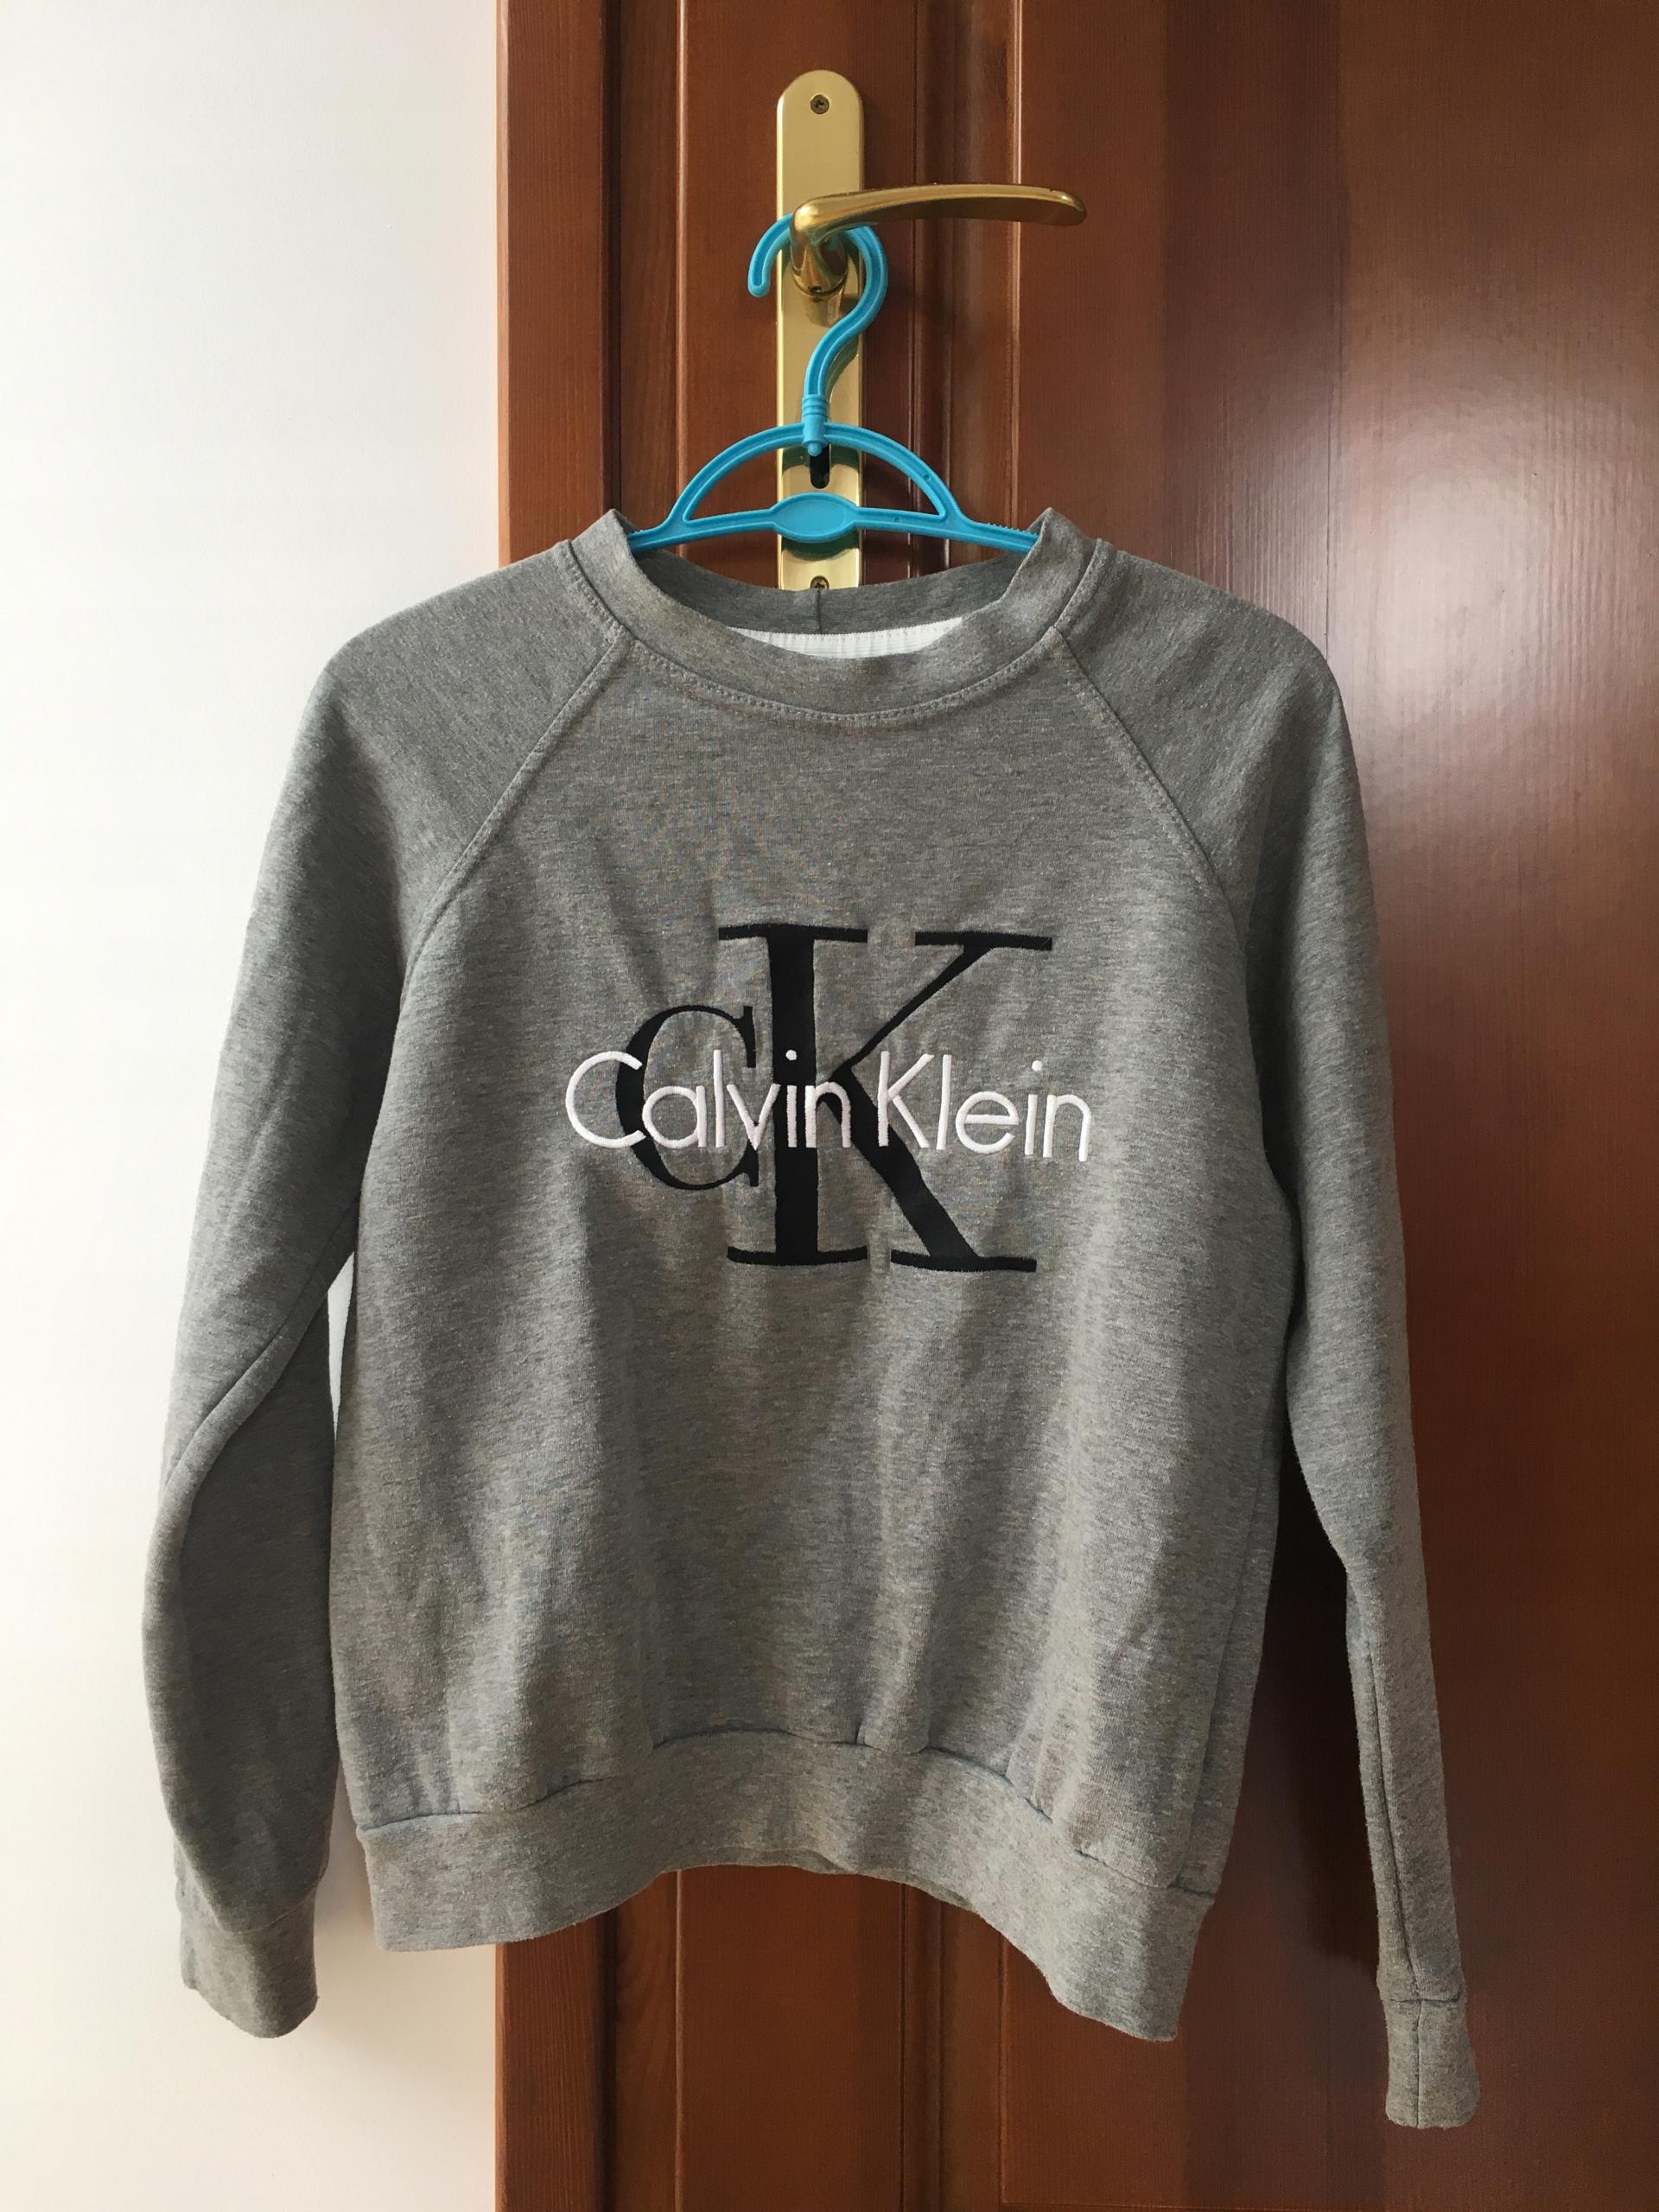 8f5b71045 Bluza Calvin Klein Szara CK Rozmiar S - 7457266557 - oficjalne ...